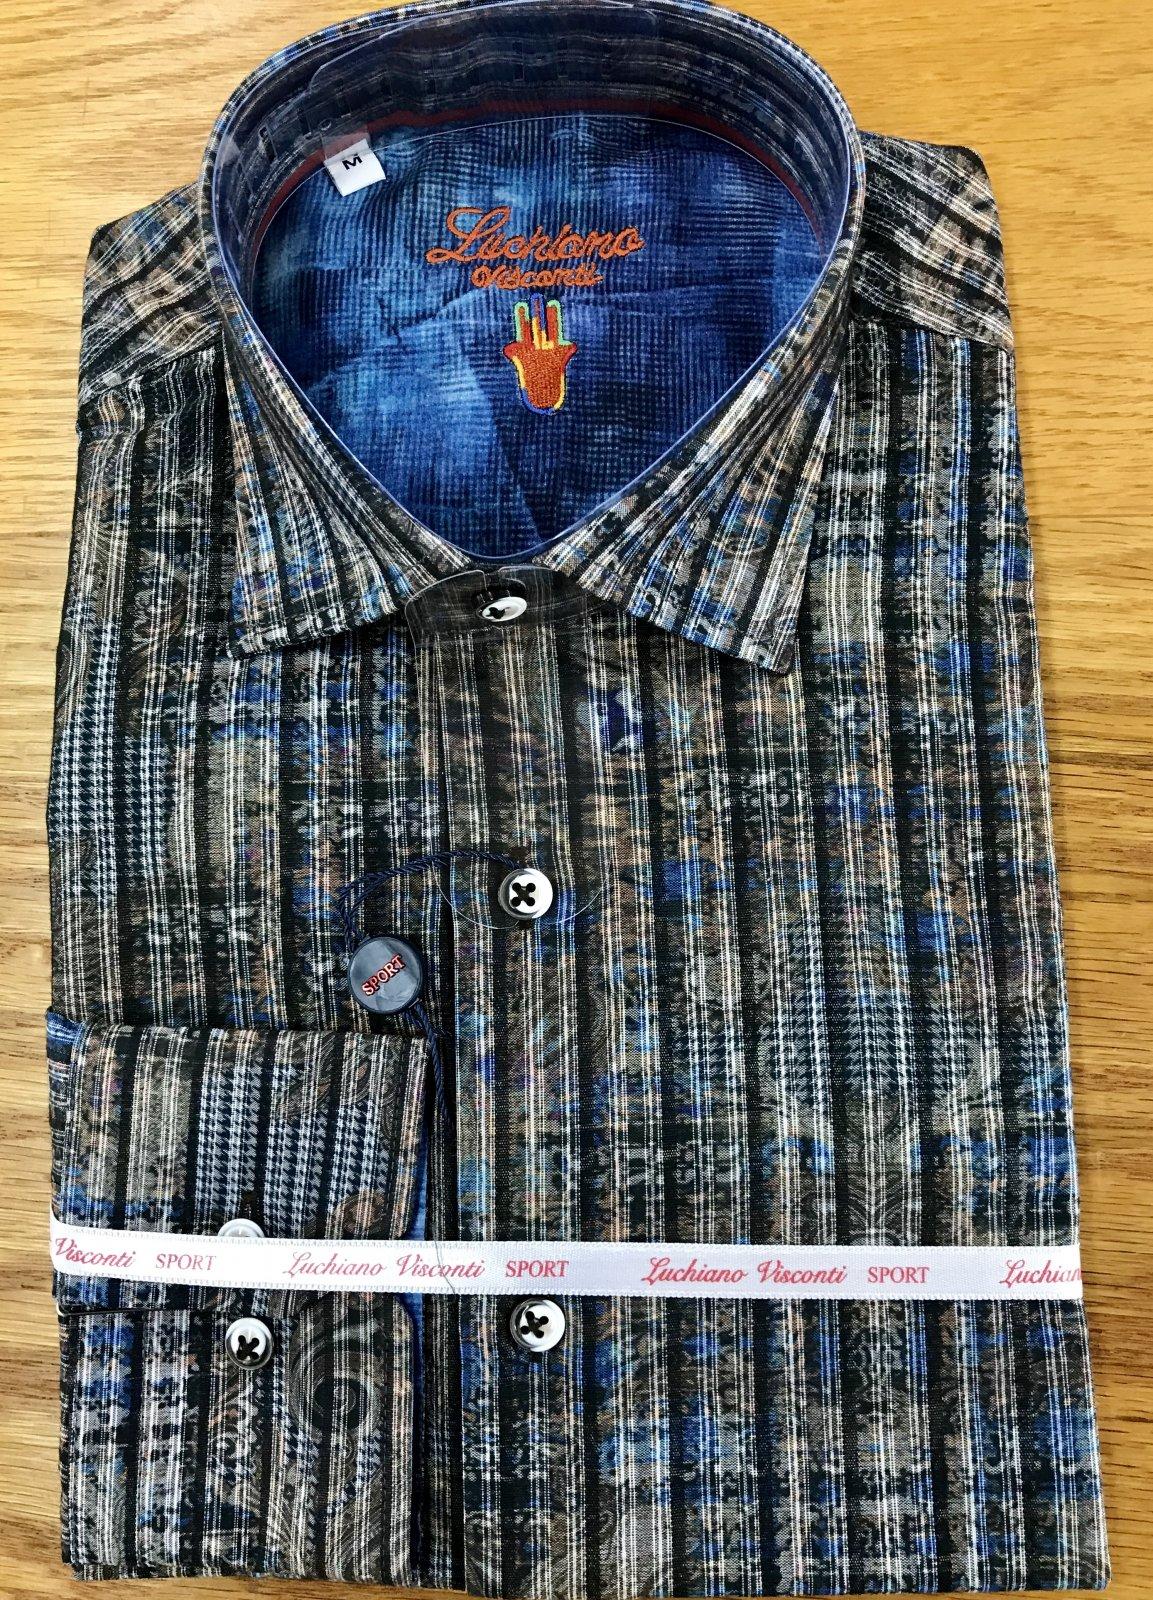 Luchiano Visconti LS Sportshirt 39111